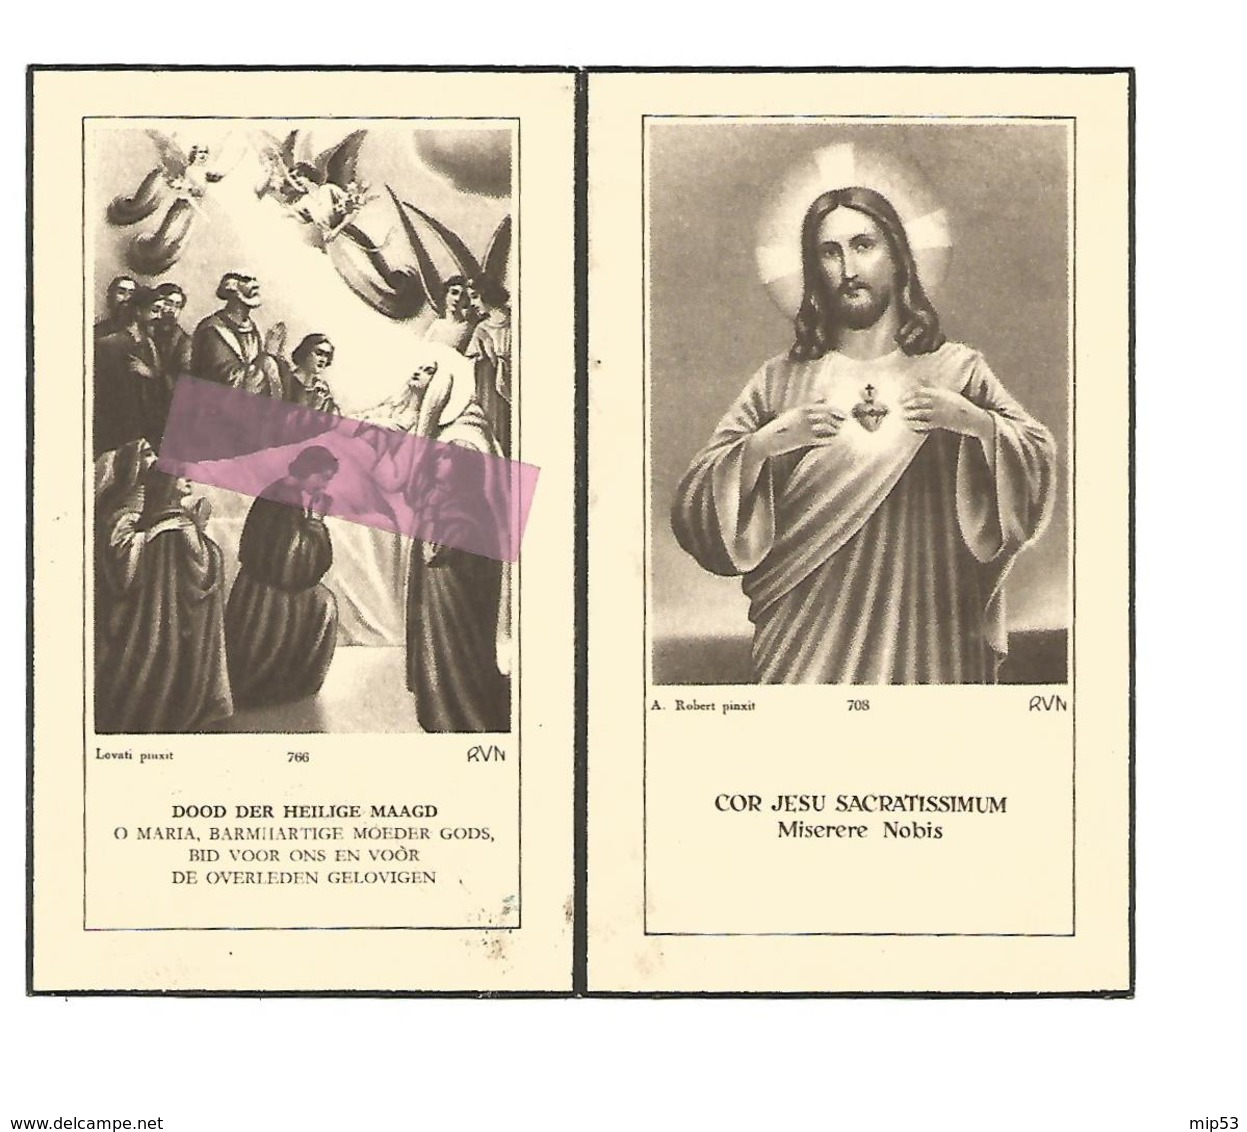 Z 337. E.Zuster PHILIPPINNE (T. WIRIX) - °ZONHOVEN 1896 / LUIK / +ST-TRUIDEN (Klein Seminarie) 1954 - Images Religieuses